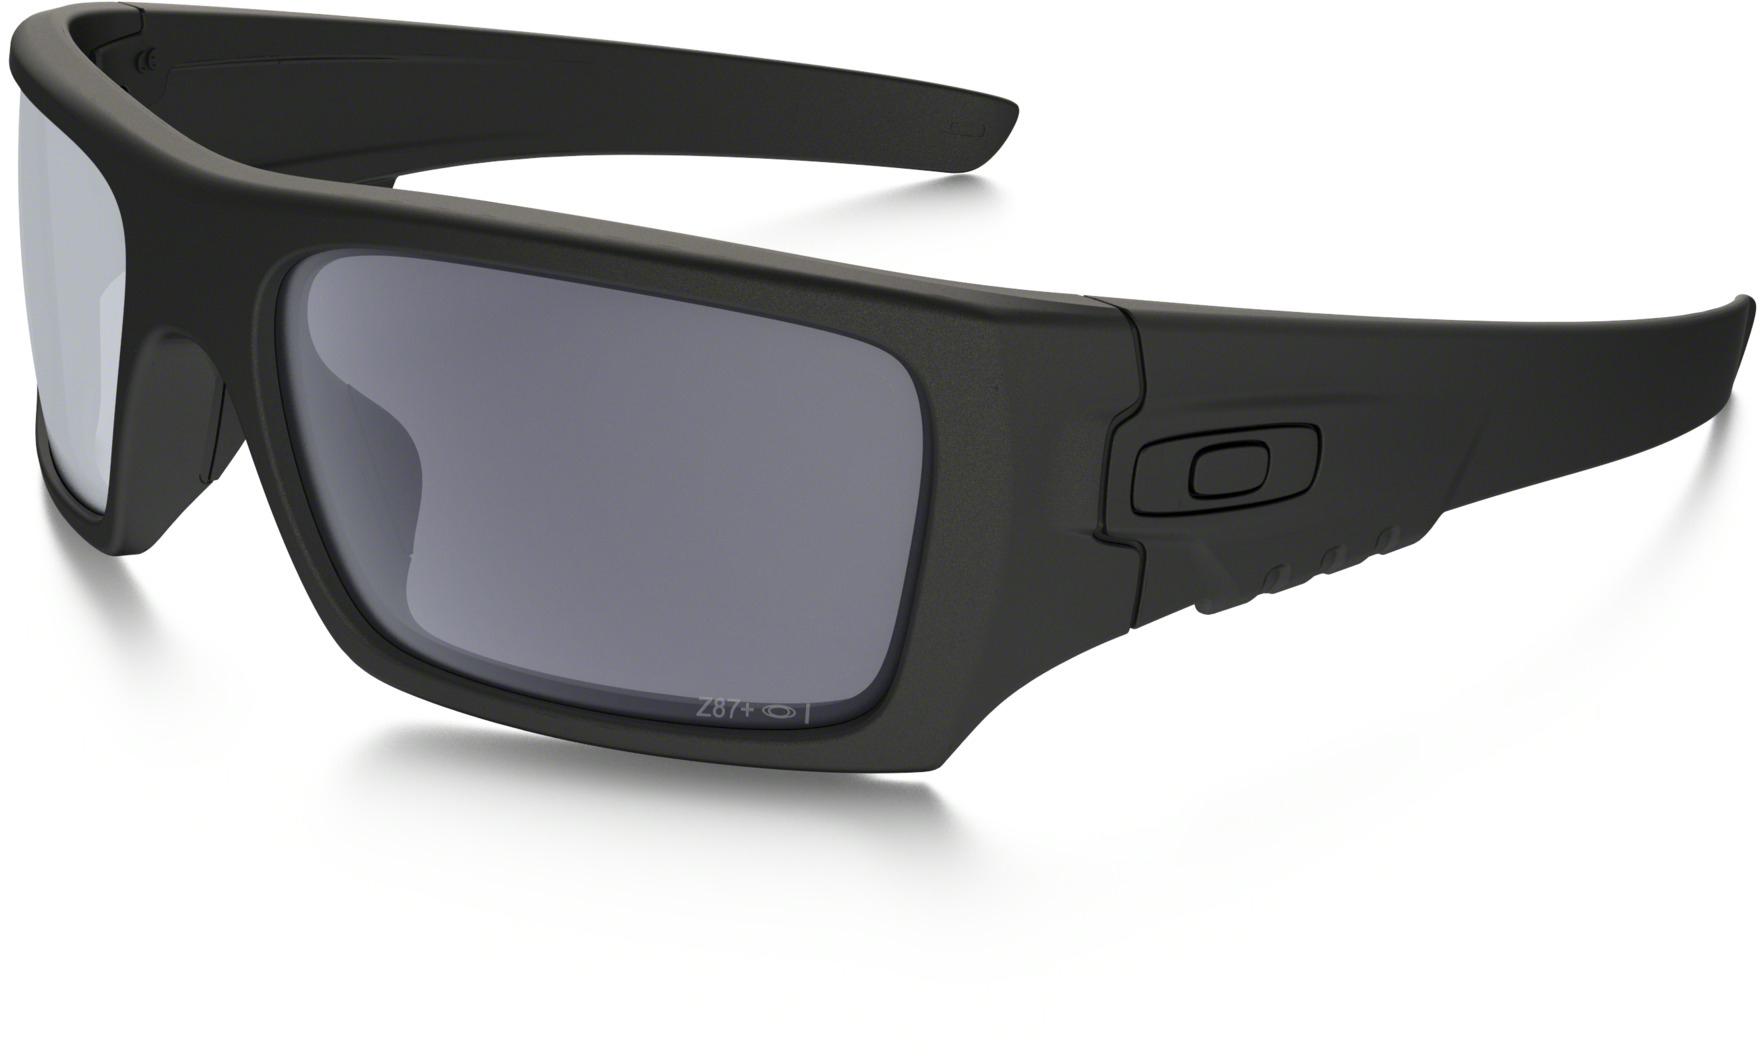 322c787cee Oakley DET CORD OO9253 Sunglasses